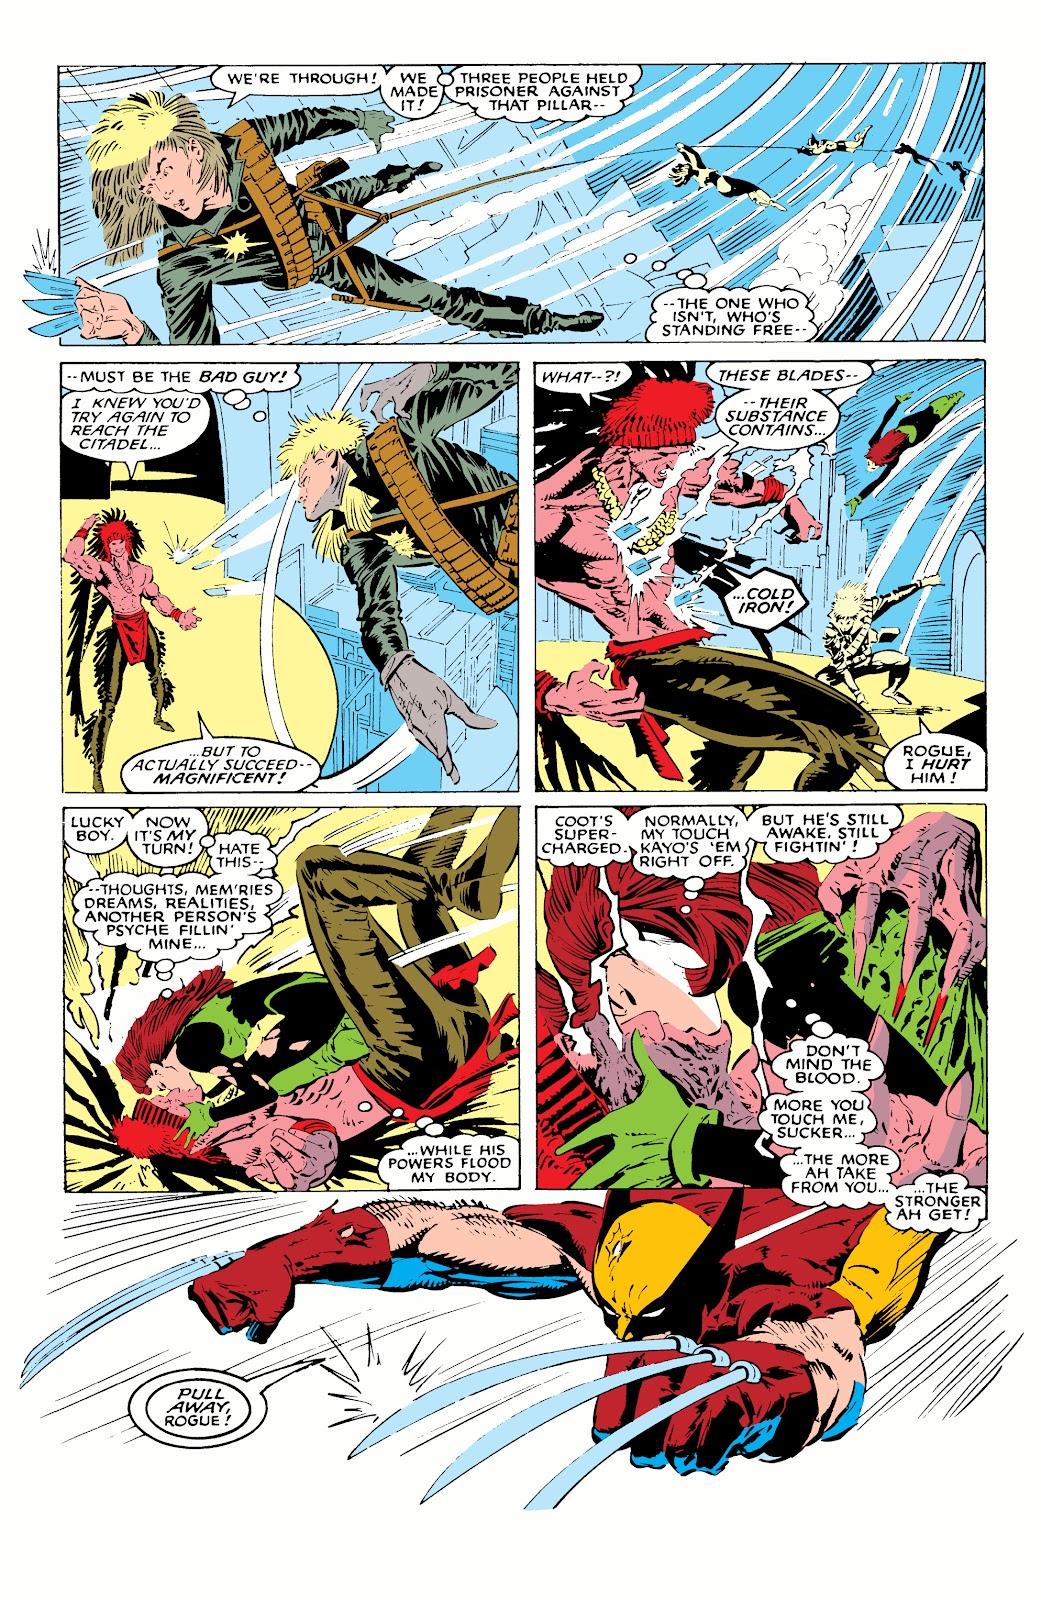 Read online X-Men Milestones: Fall of the Mutants comic -  Issue # TPB (Part 1) - 81